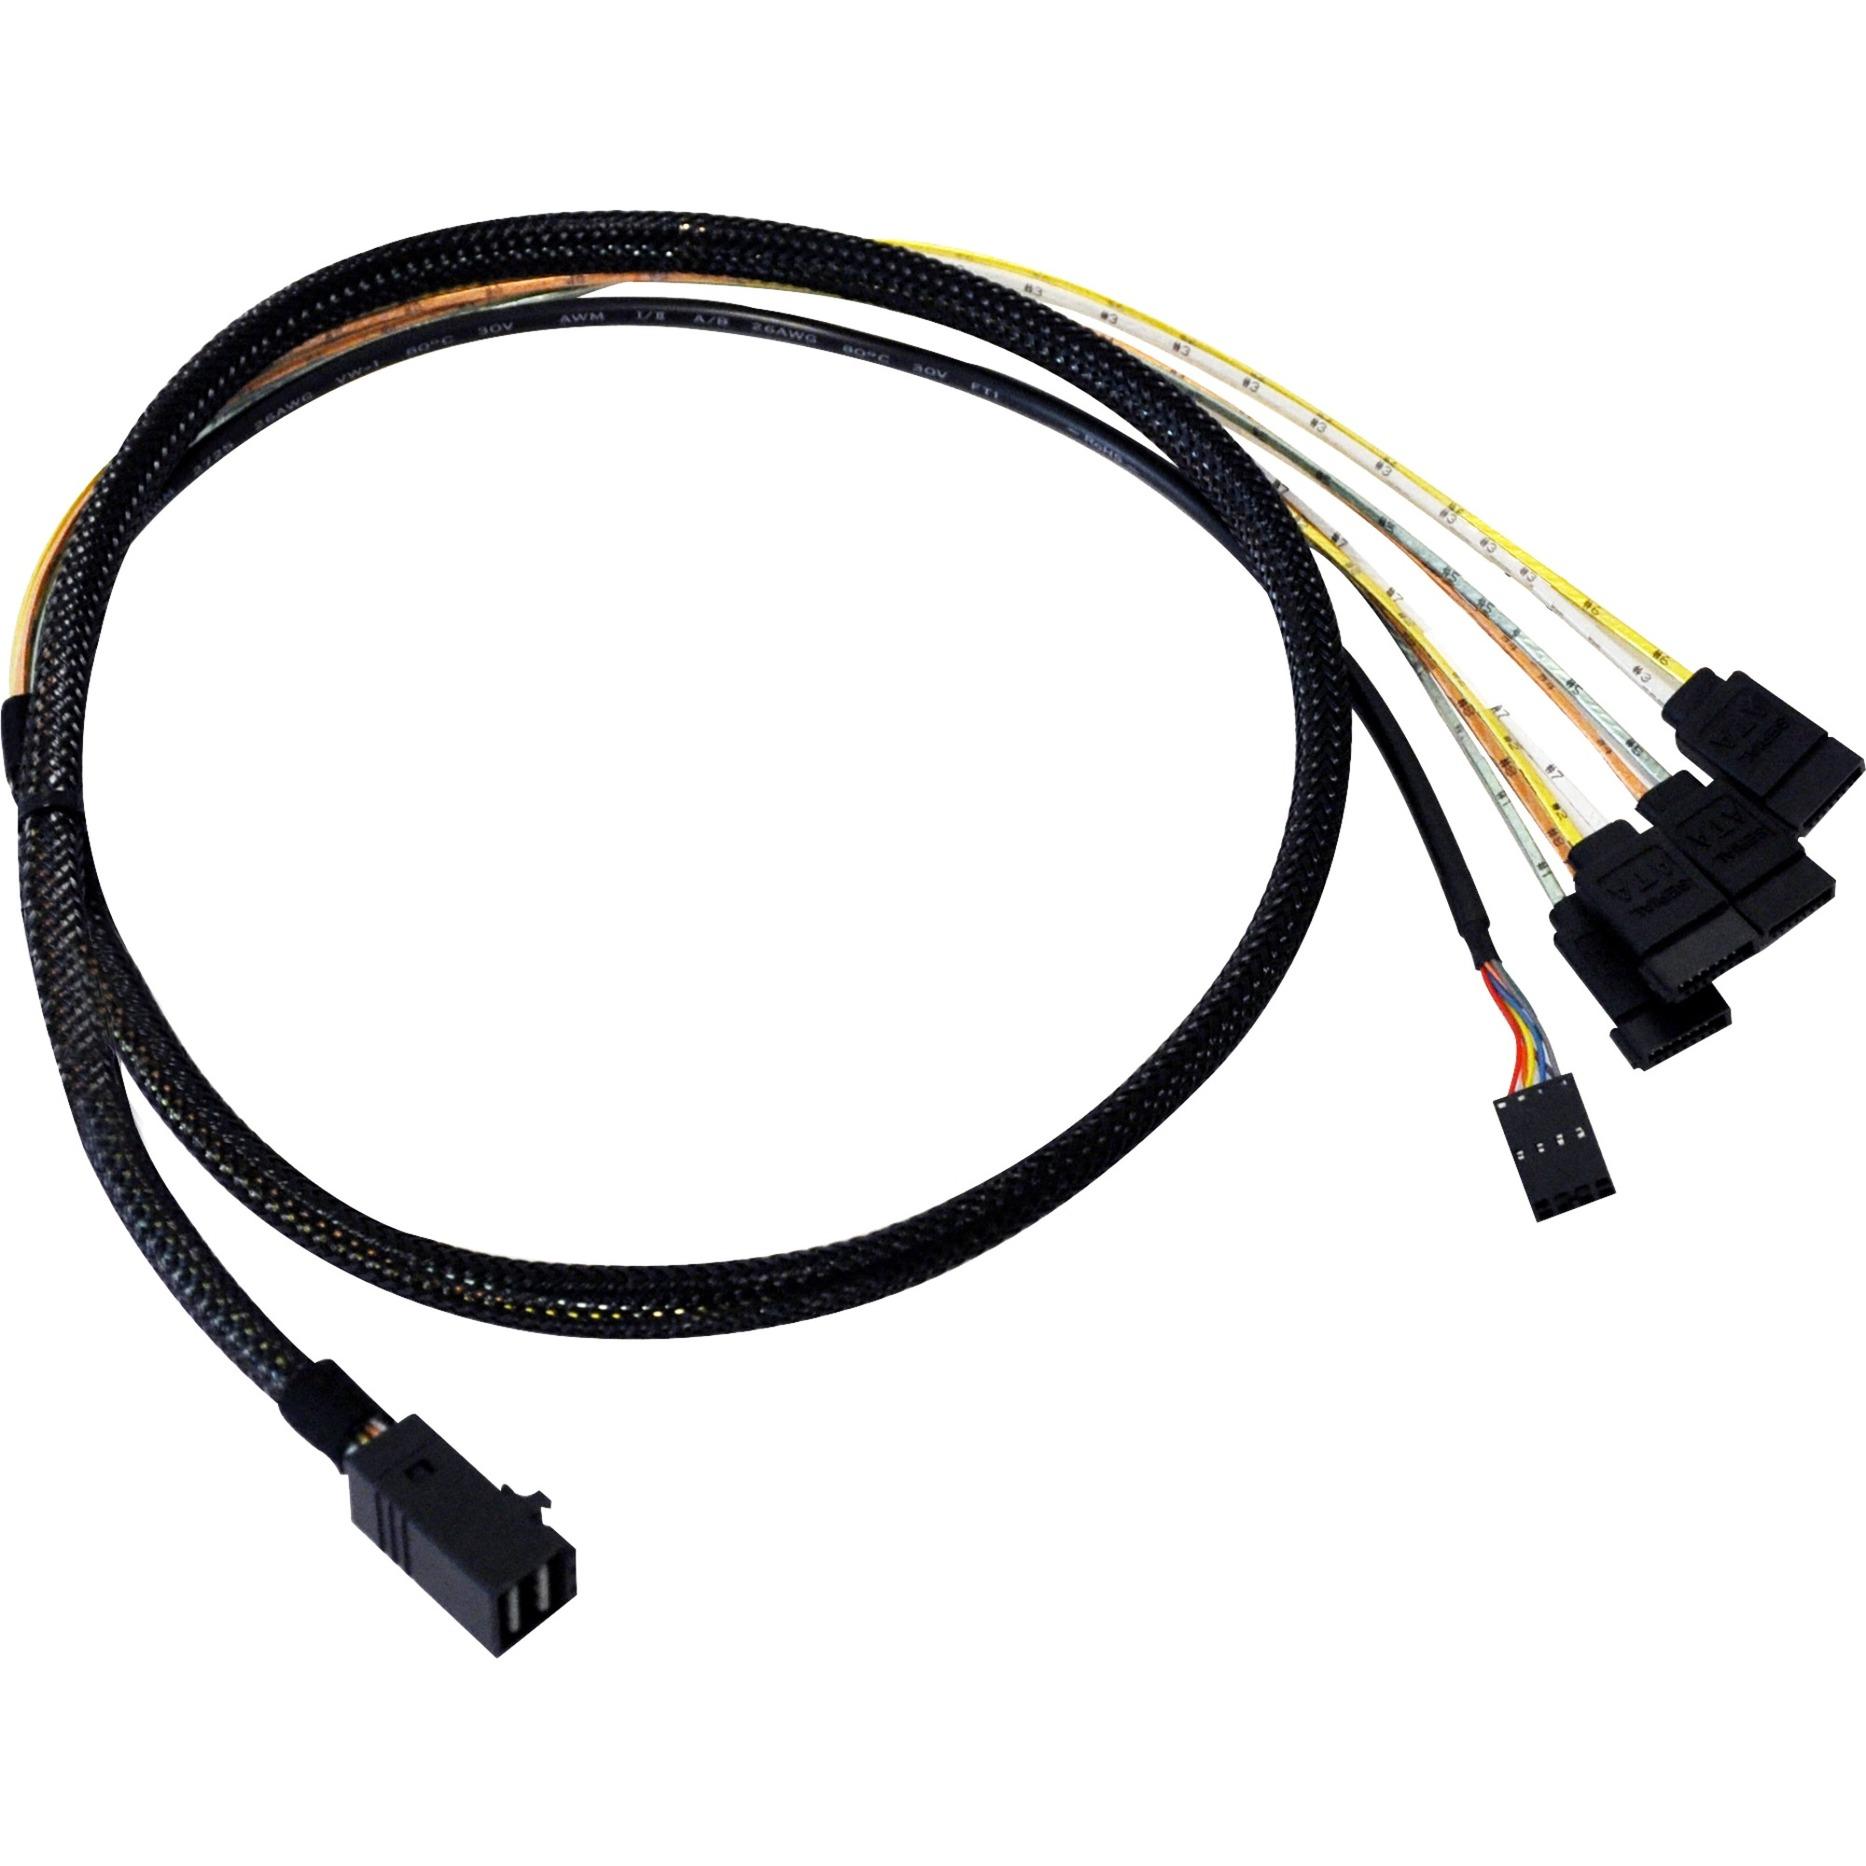 L5-00221-00 cable Serial Attached SCSI (SAS) 1 m Negro, Adaptador